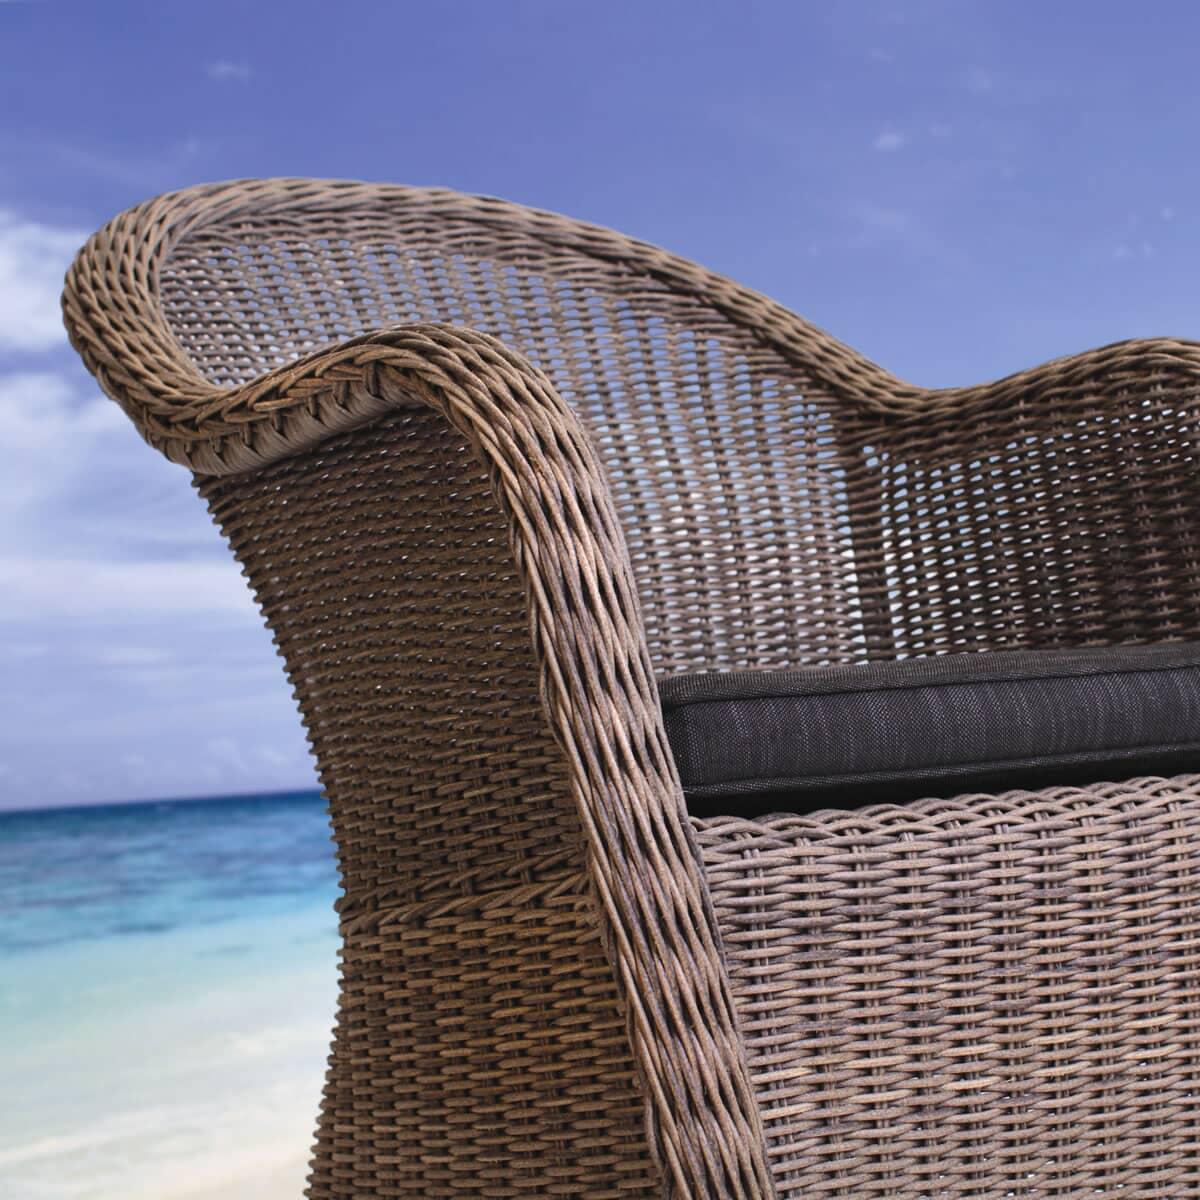 Kettler love seat rattan 01022302100 garden furniture for Cane and wicker world